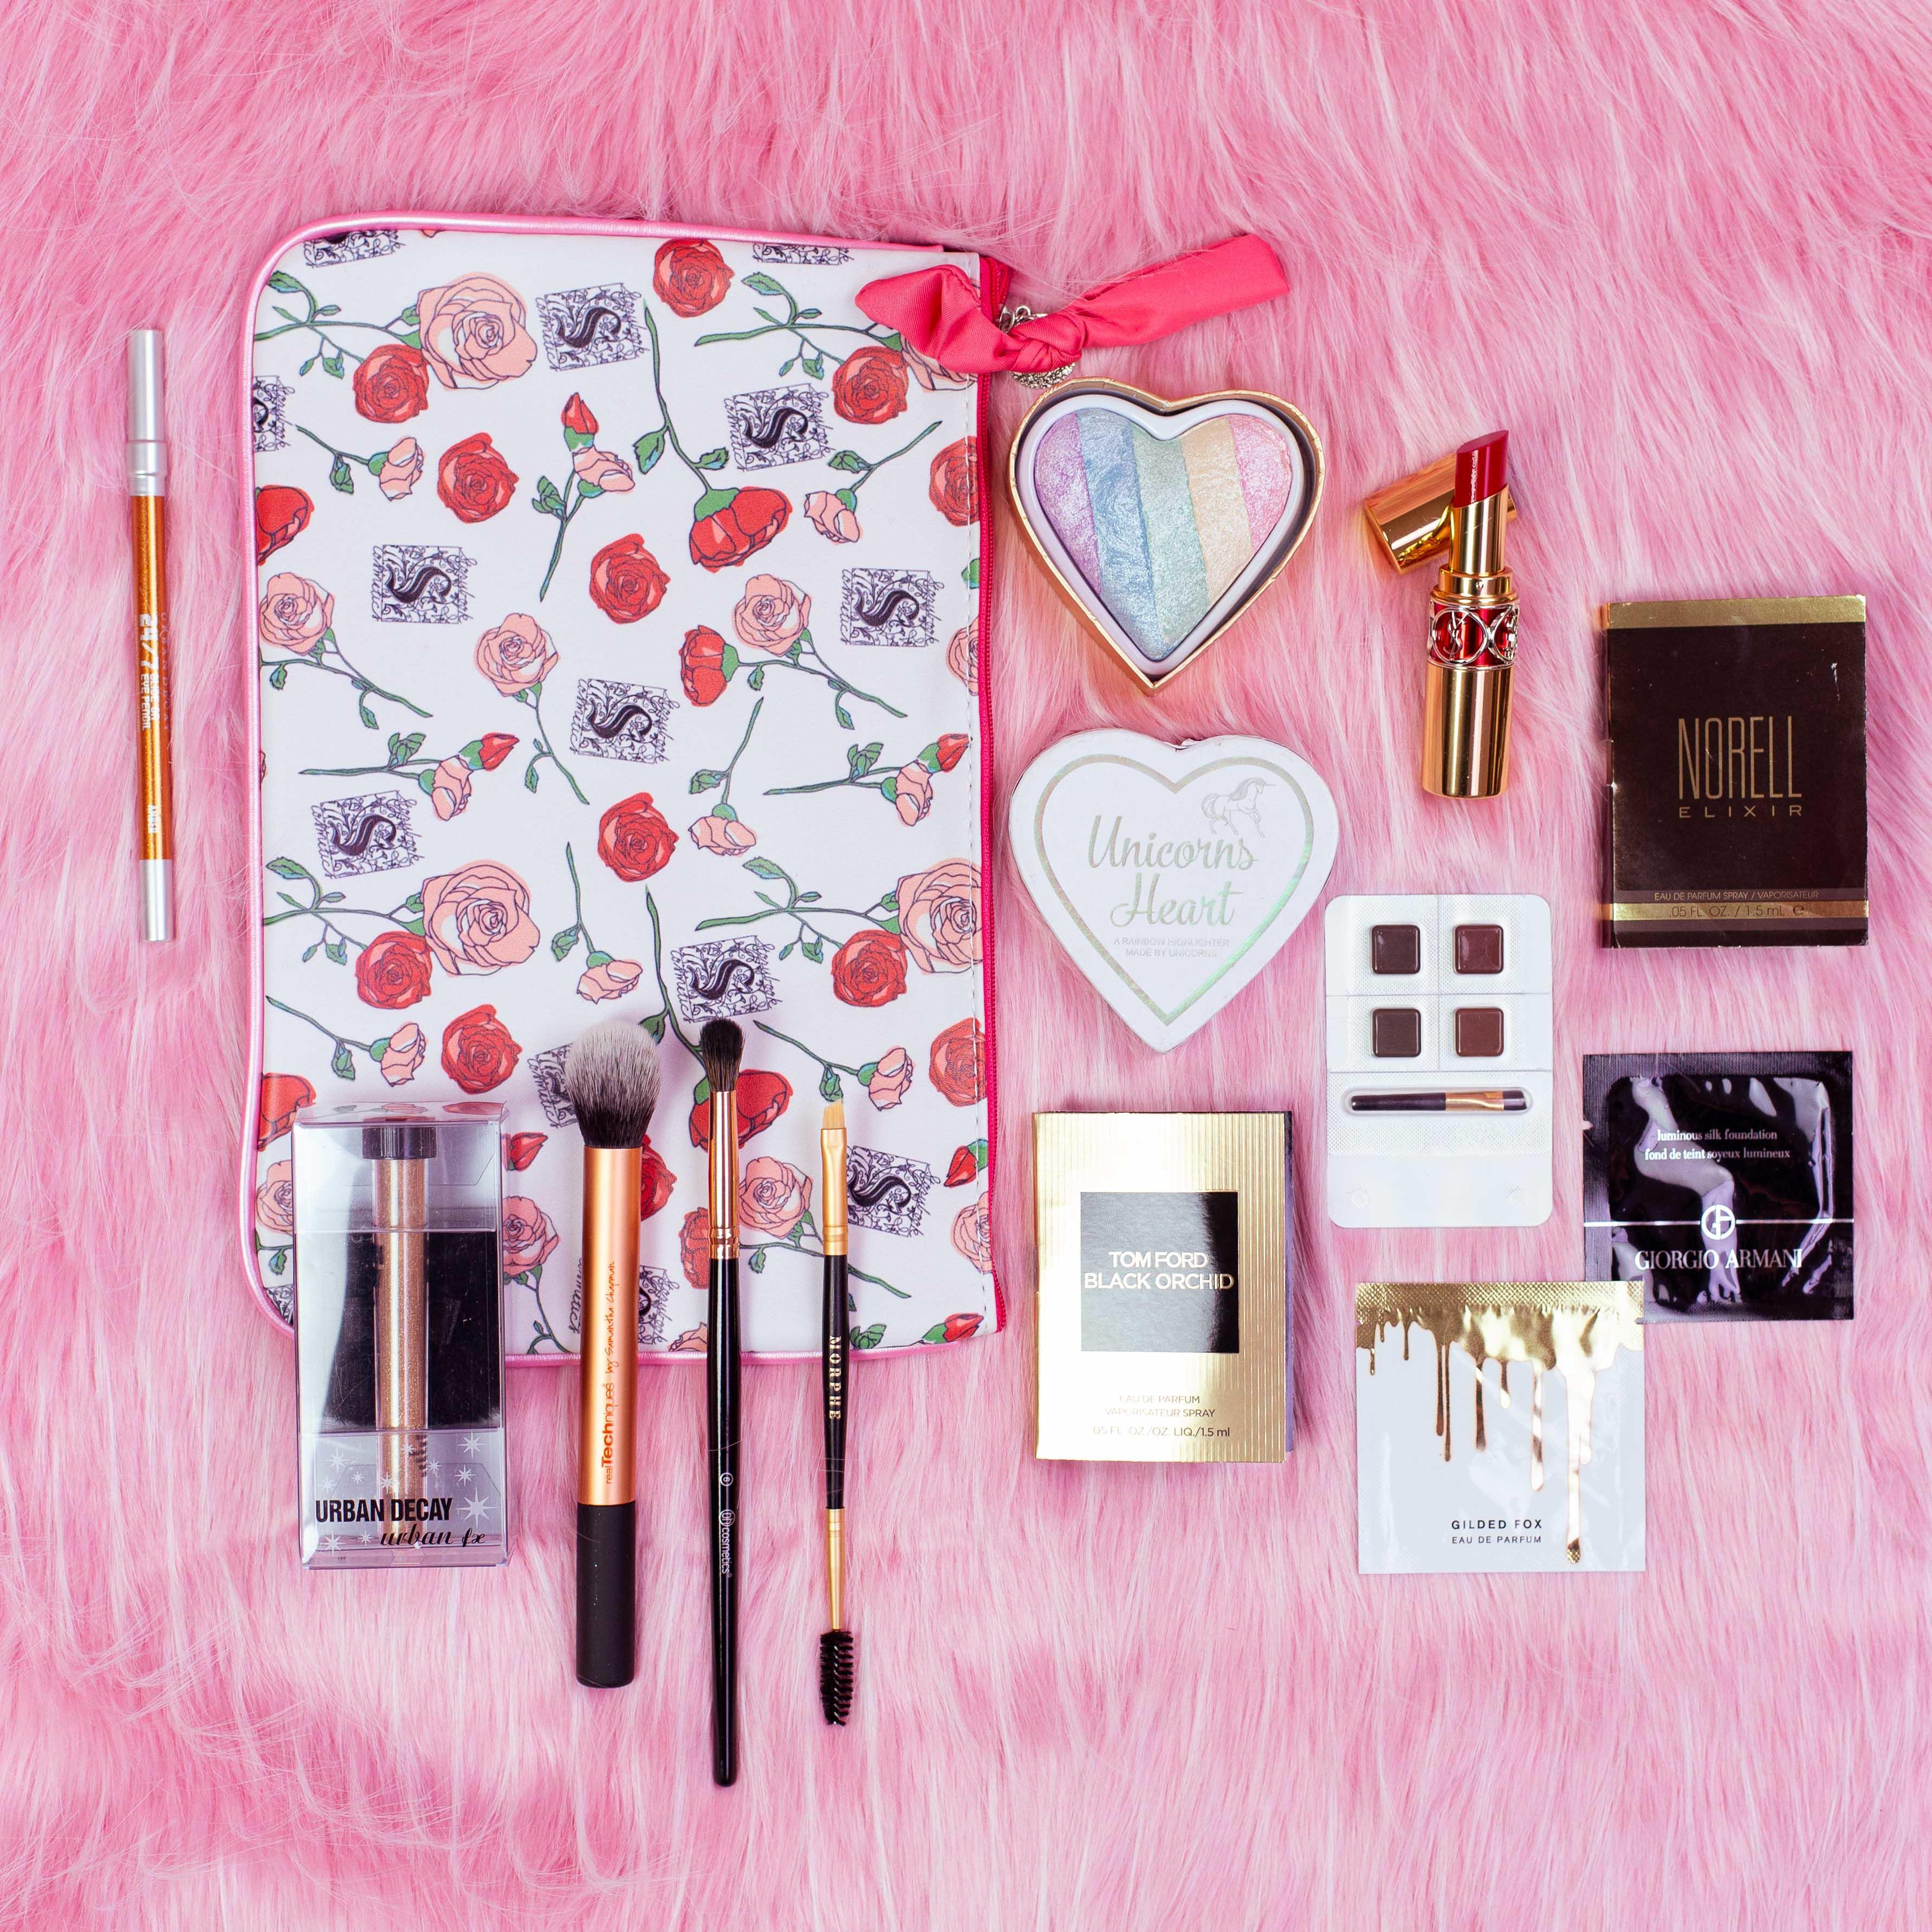 💖 Hottie Haul Storybook Cosmetics Roses 39